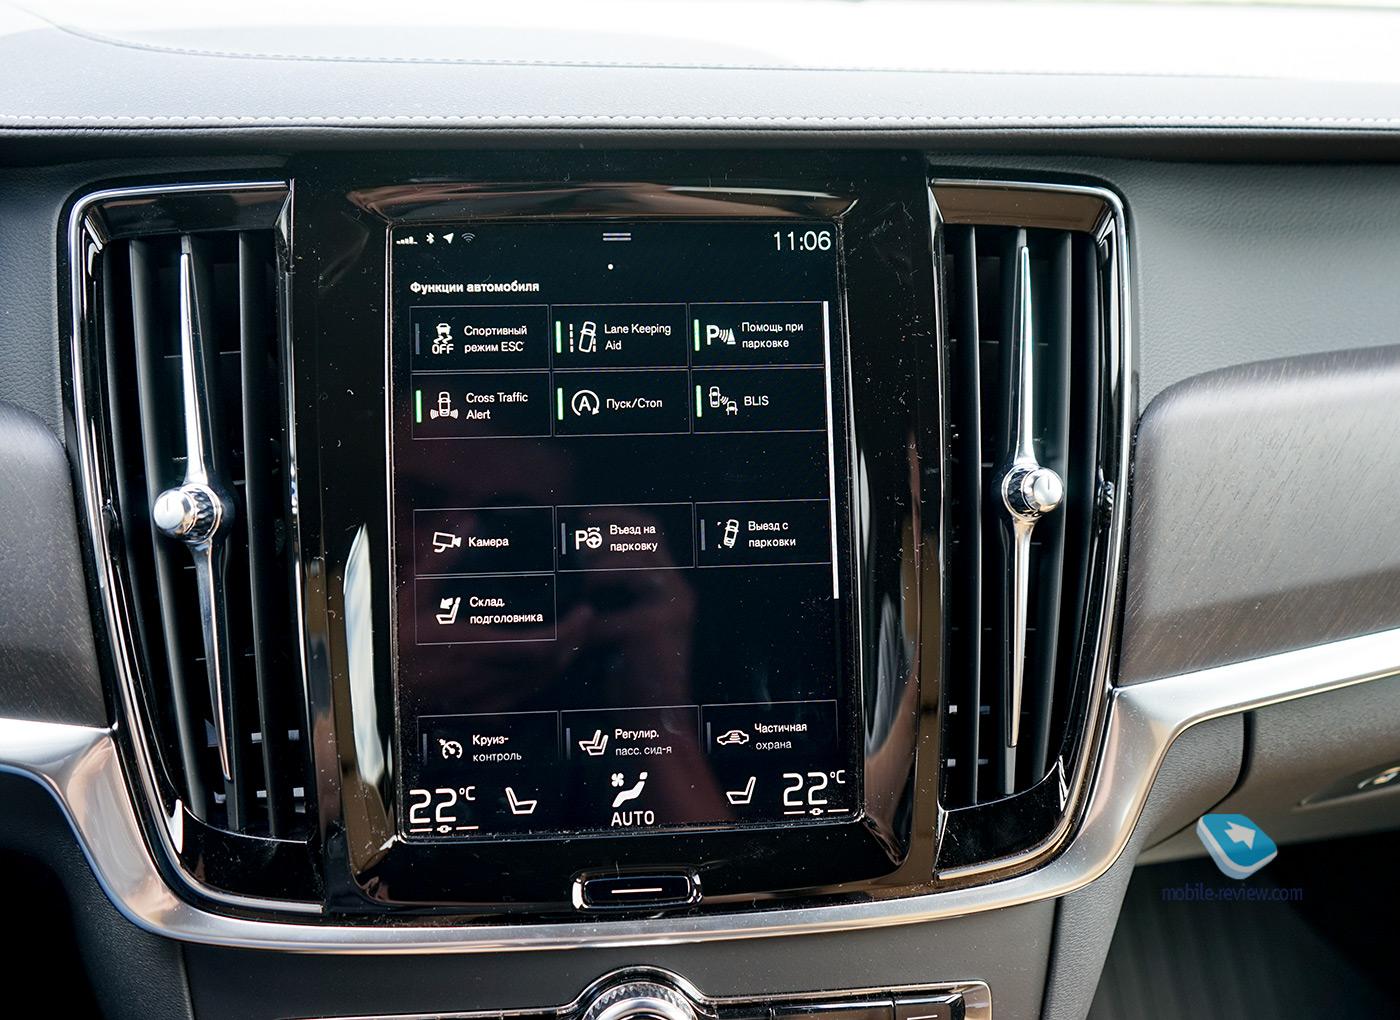 Тест Volvo V90 Cross Country. Самый красивый универсал